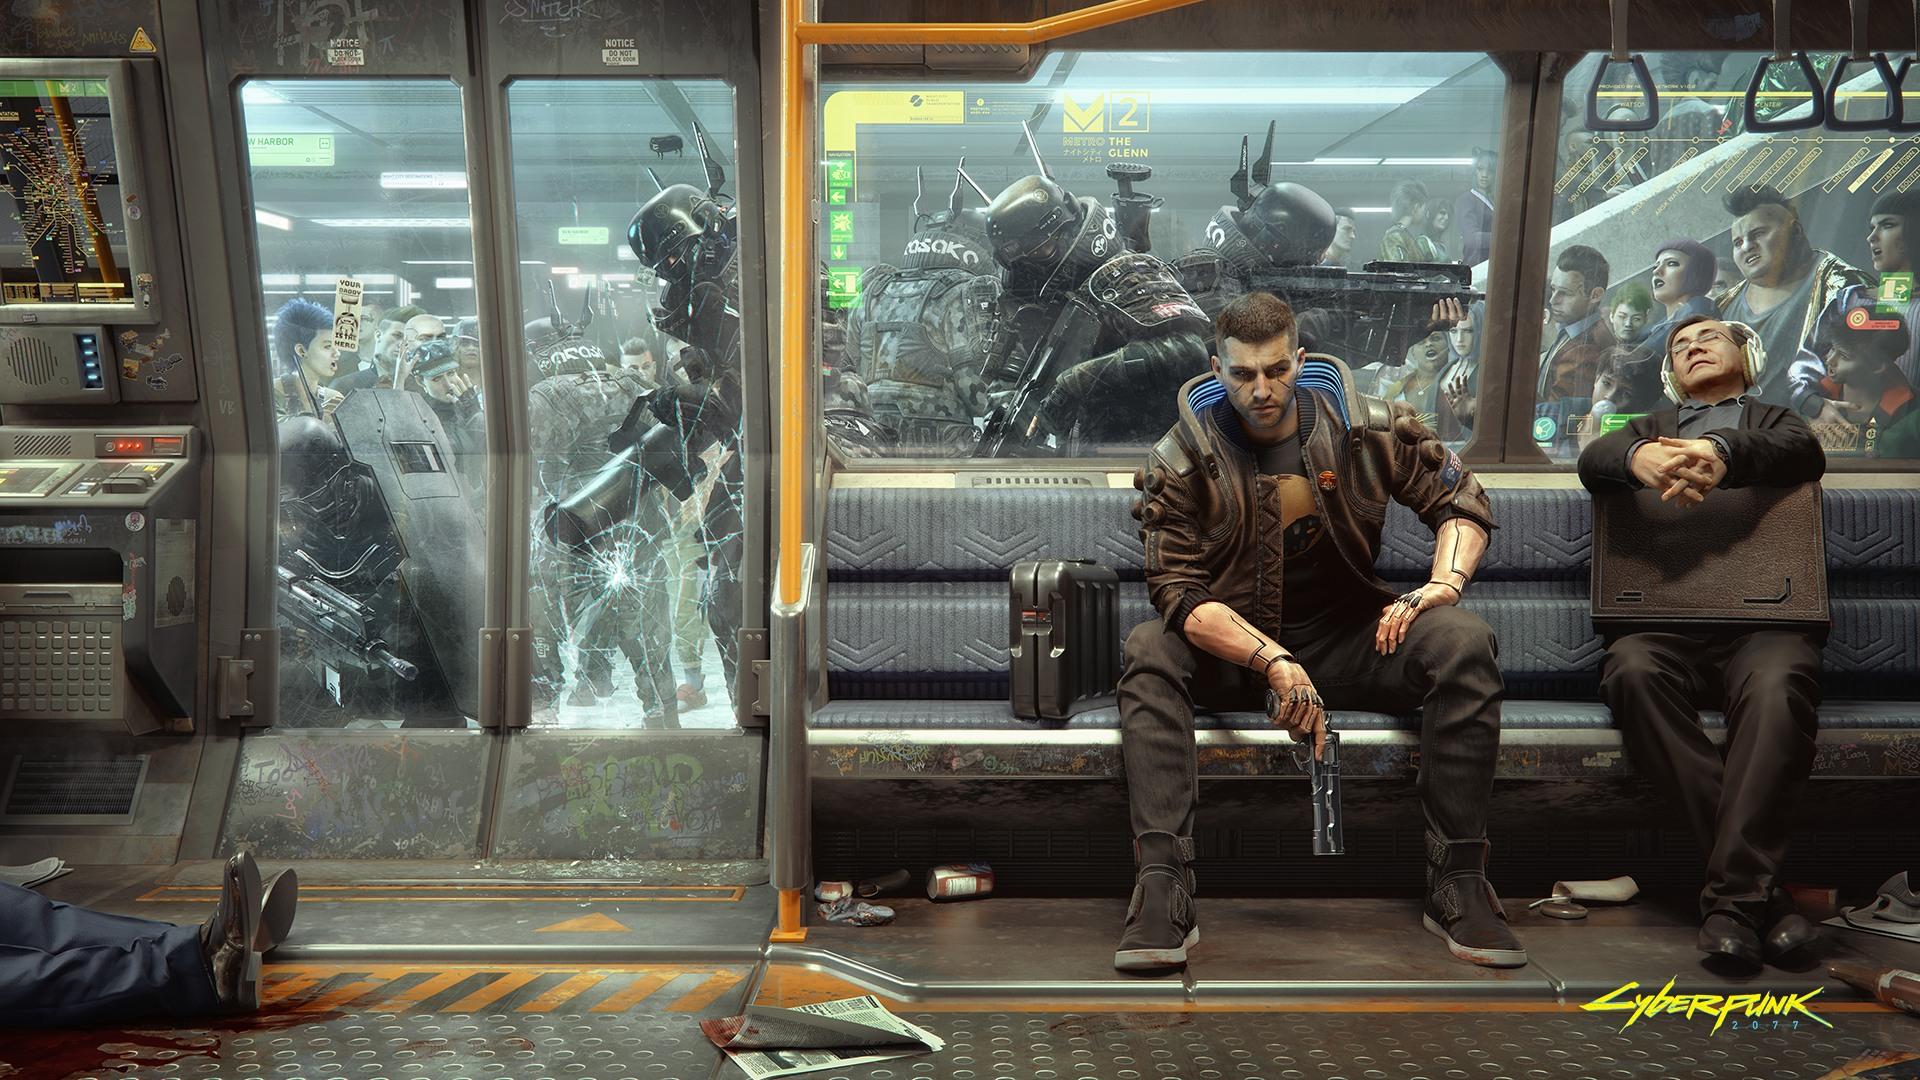 I'm hopeful Cyberpunk 2077 won't just be a good game, but a damn good role-playing experience screenshot